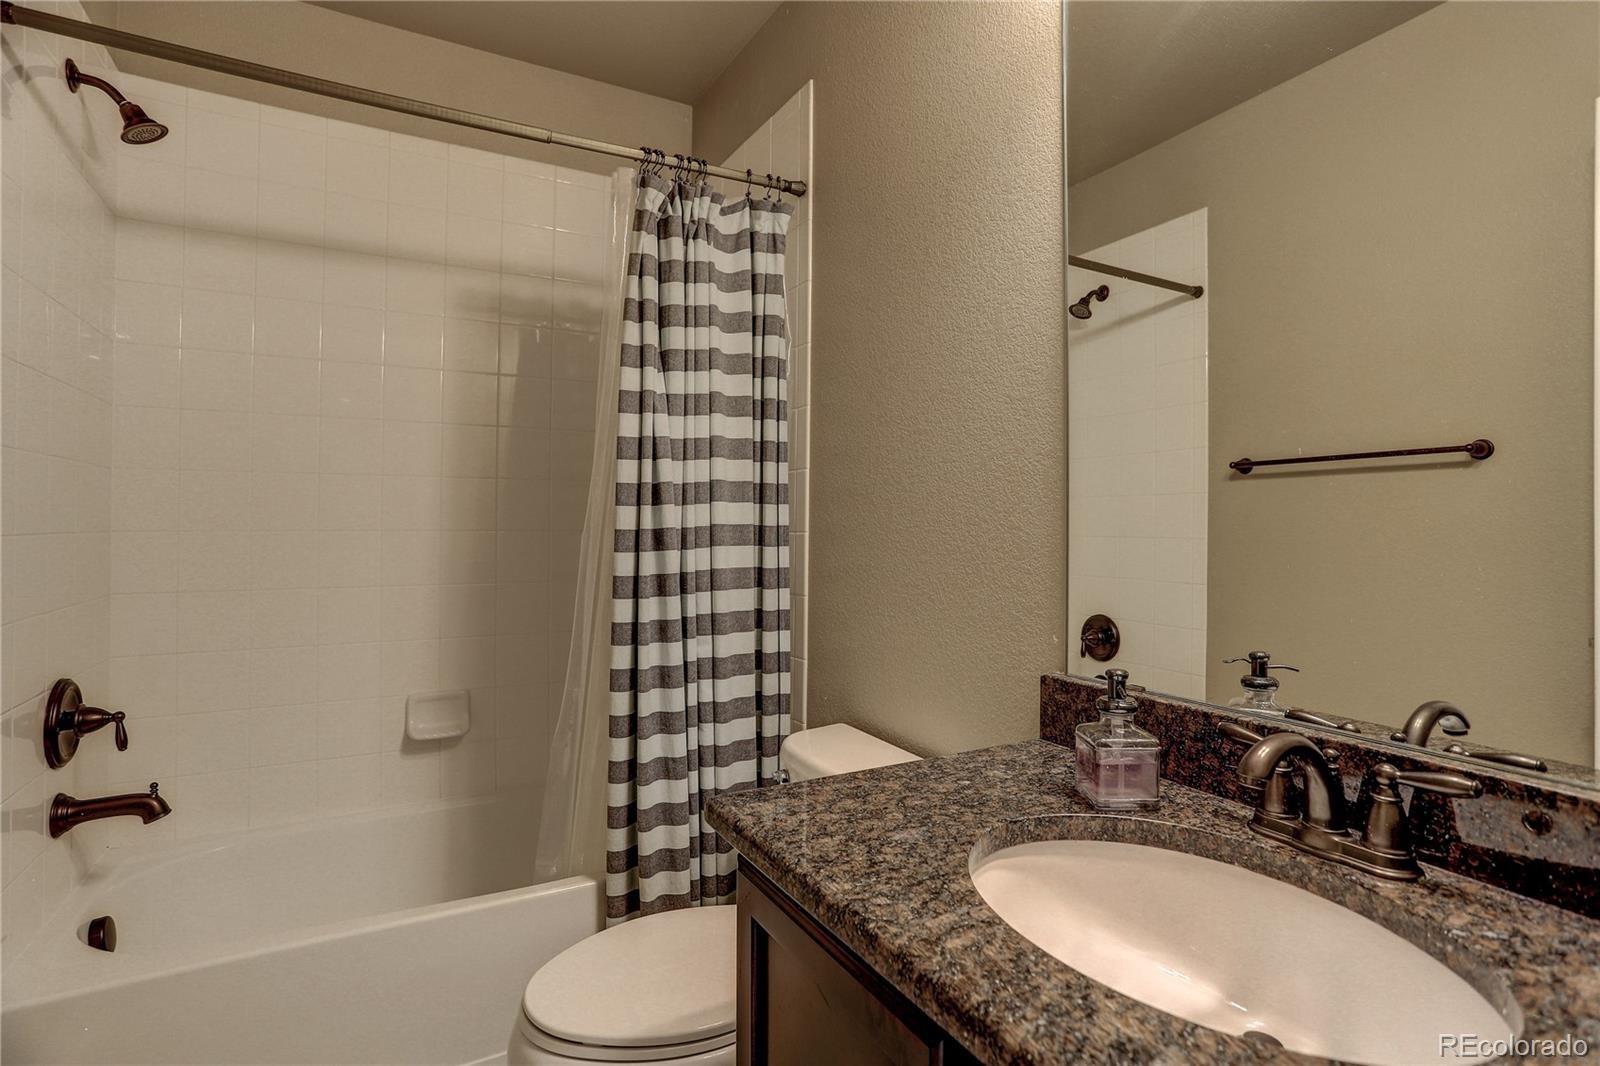 MLS# 6992885 - 35 - 8084 E 31st Avenue, Denver, CO 80238